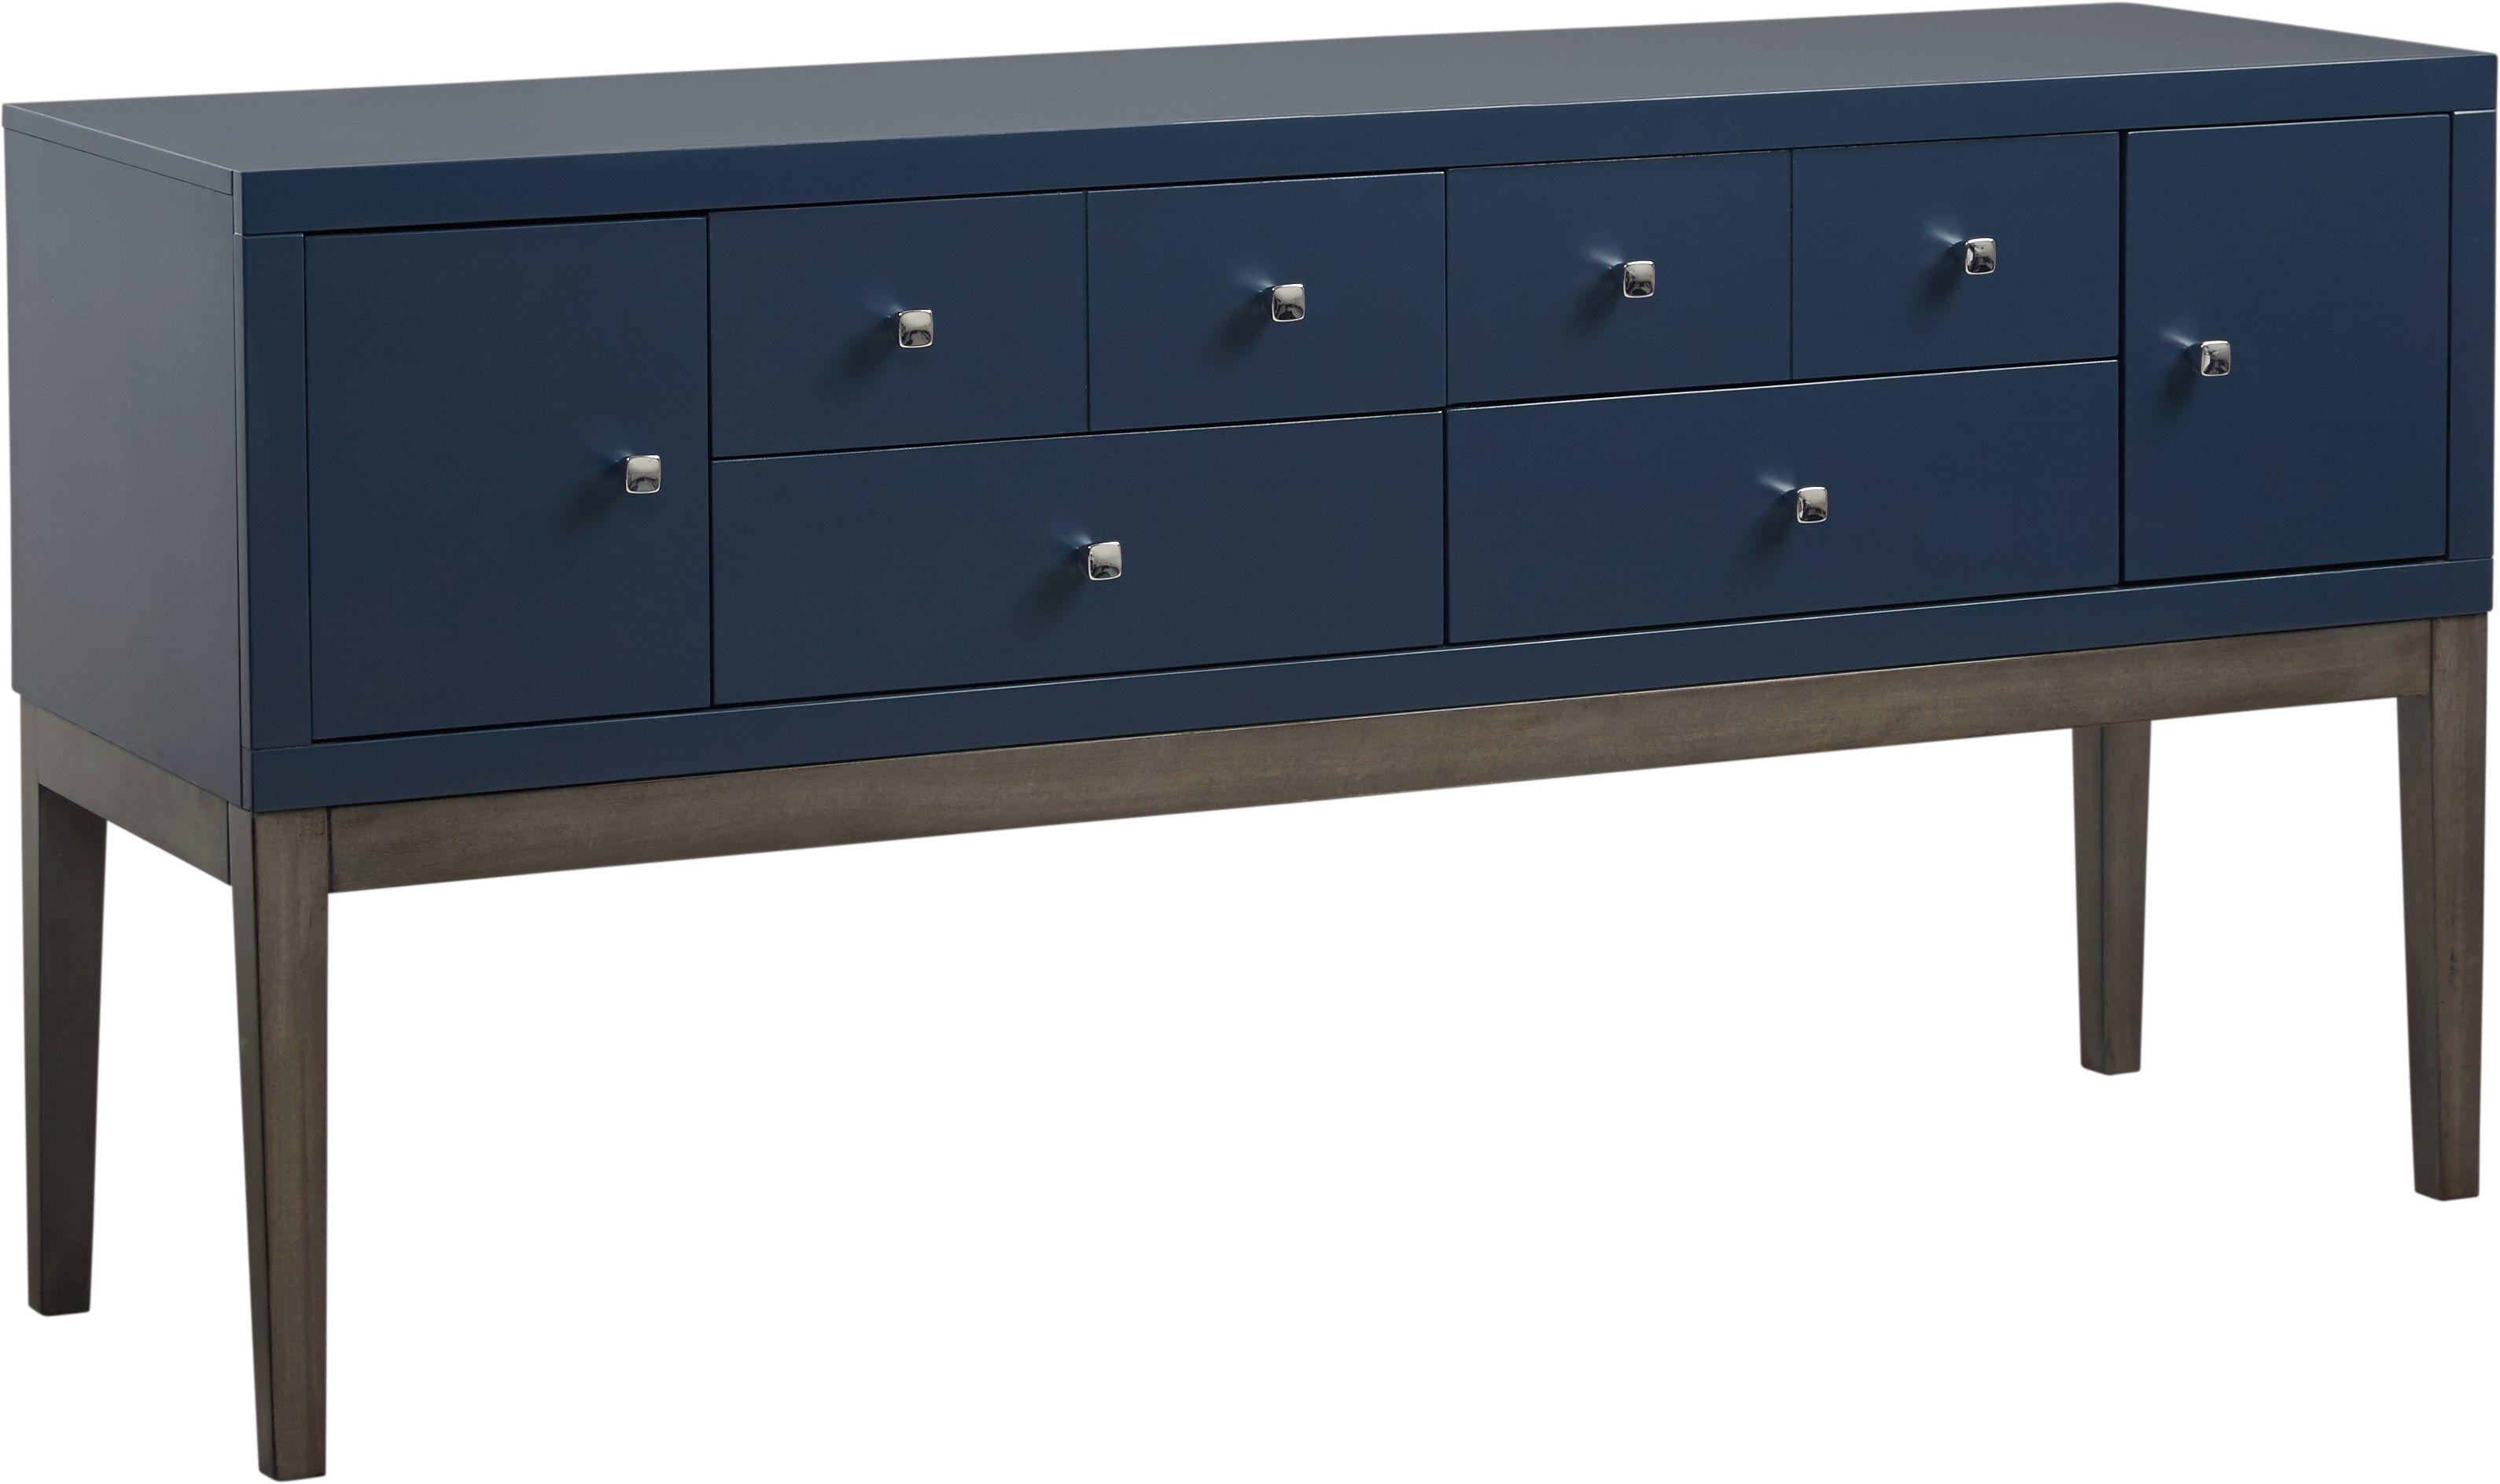 Skyler Navy Credenza Accent Cabinet Stylish Storage Cabinet